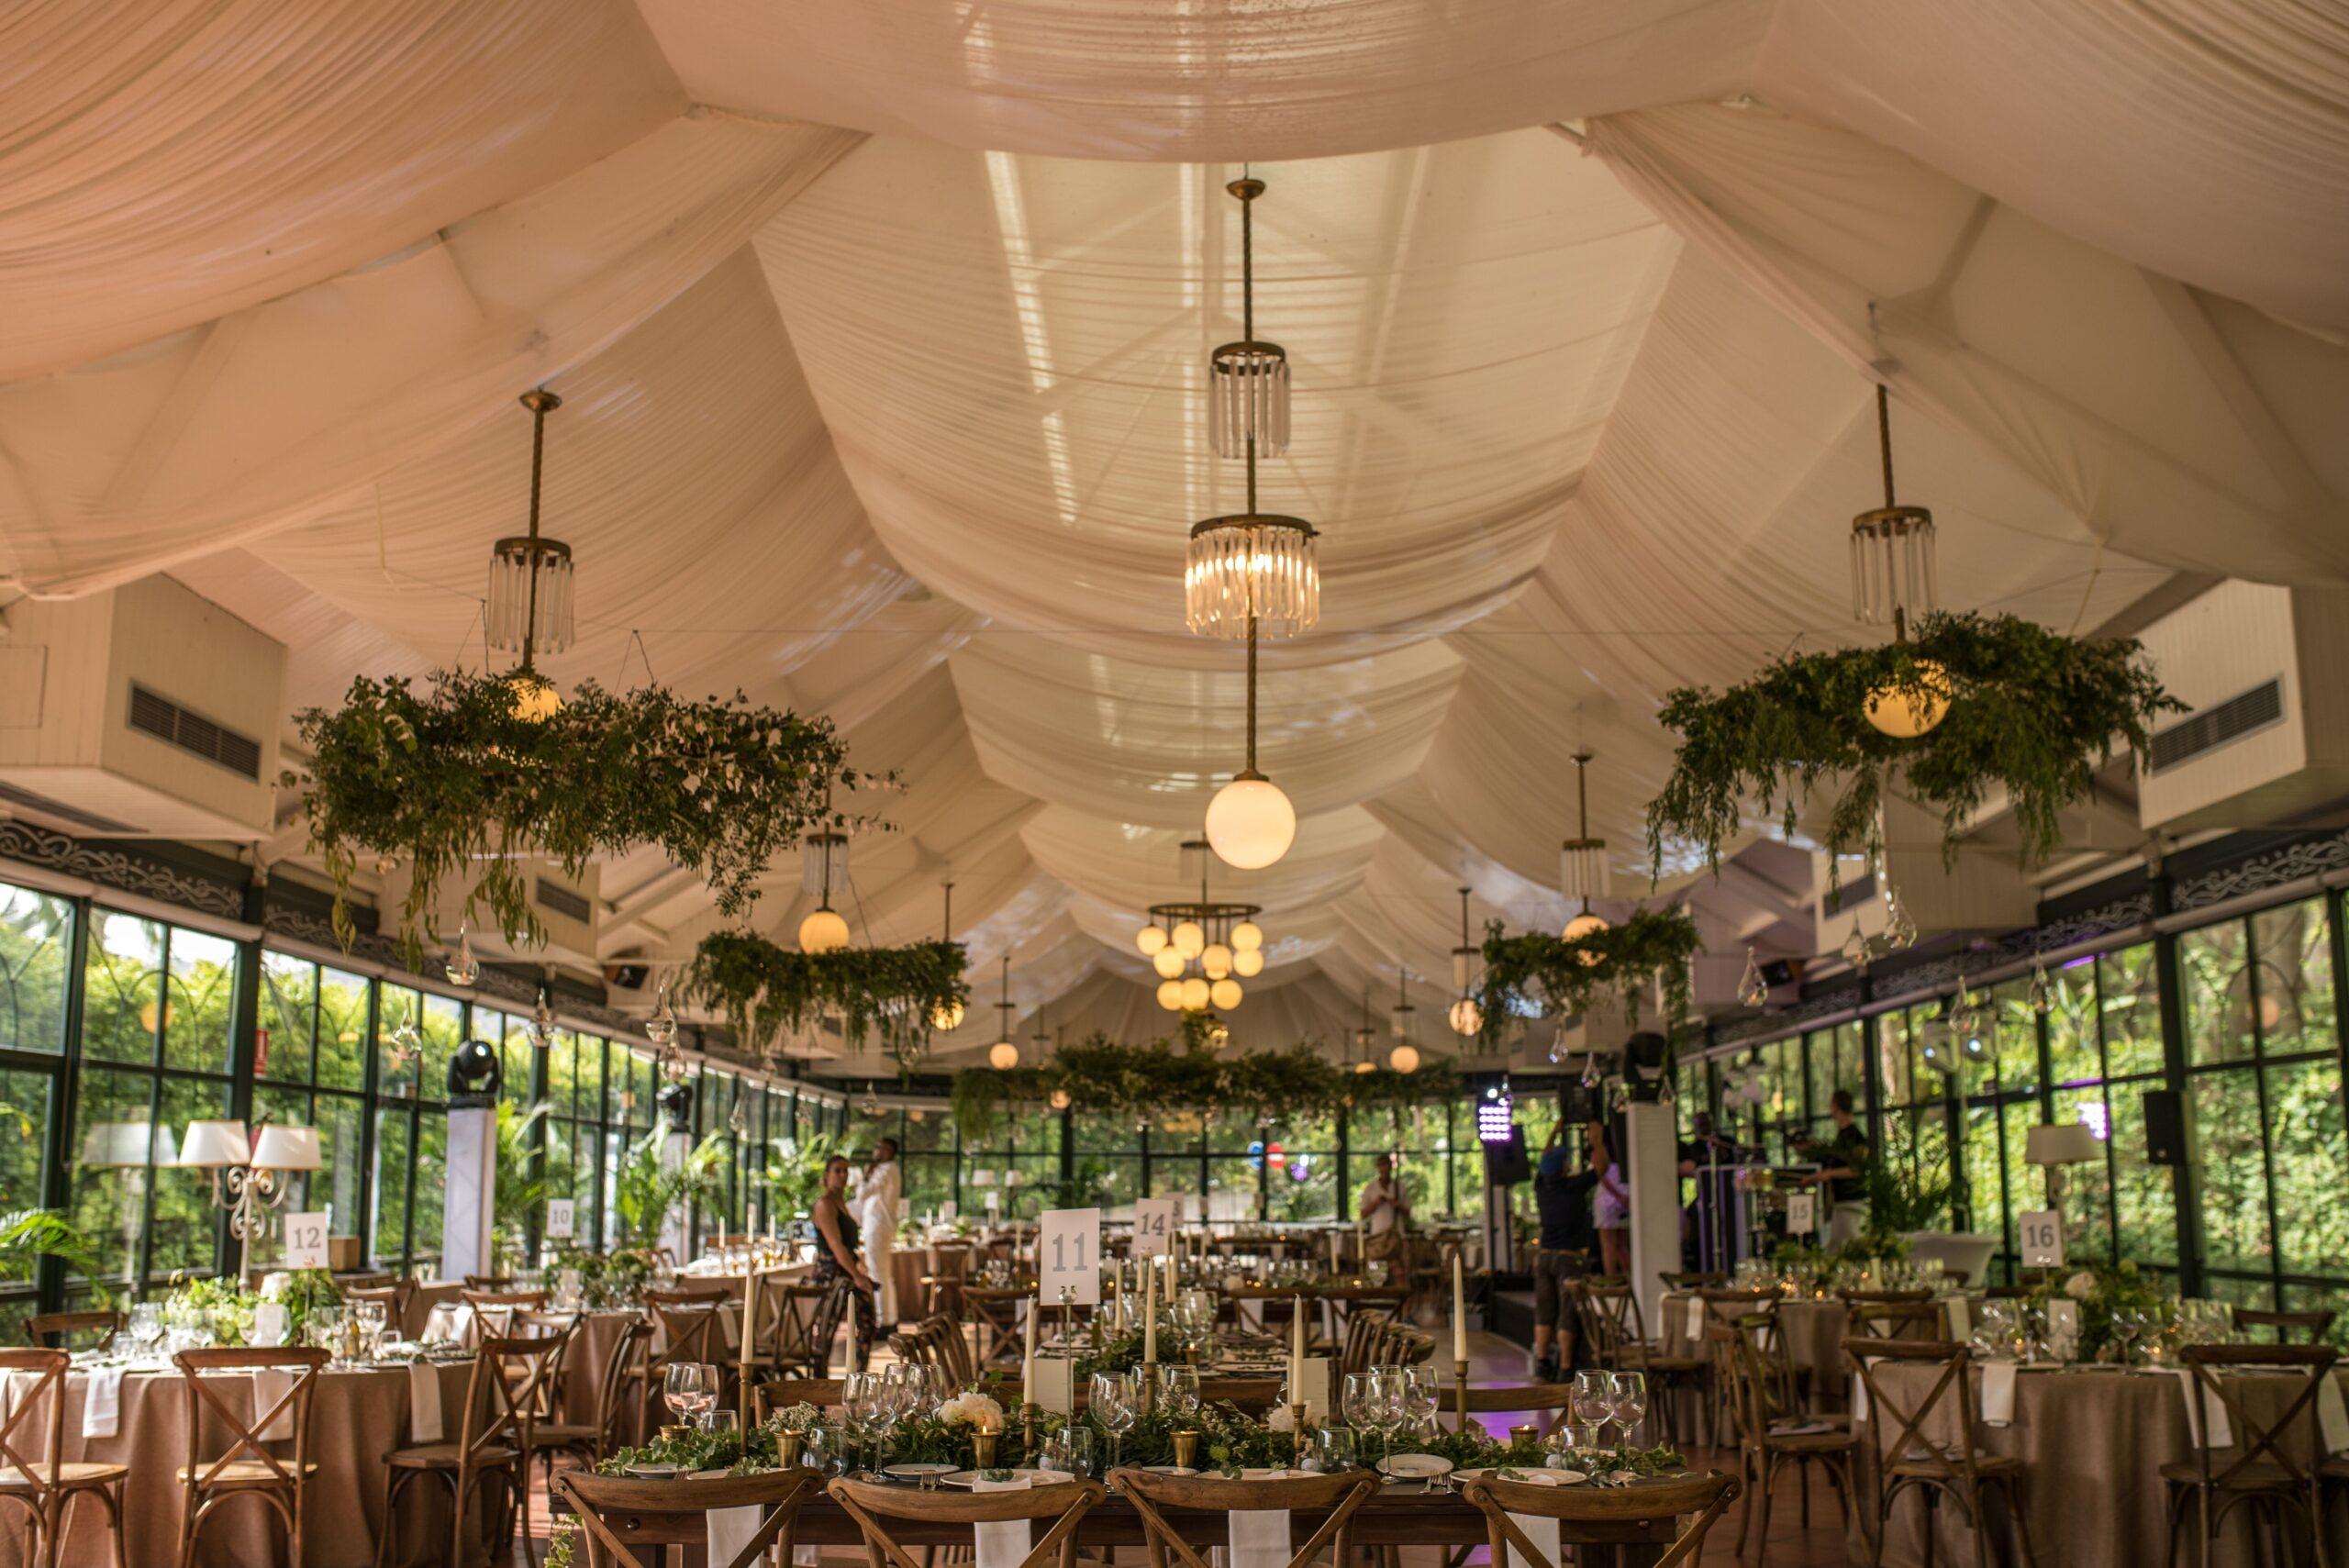 Stunning wedding decor ready for the wedding breakfast - Jeremy Standley